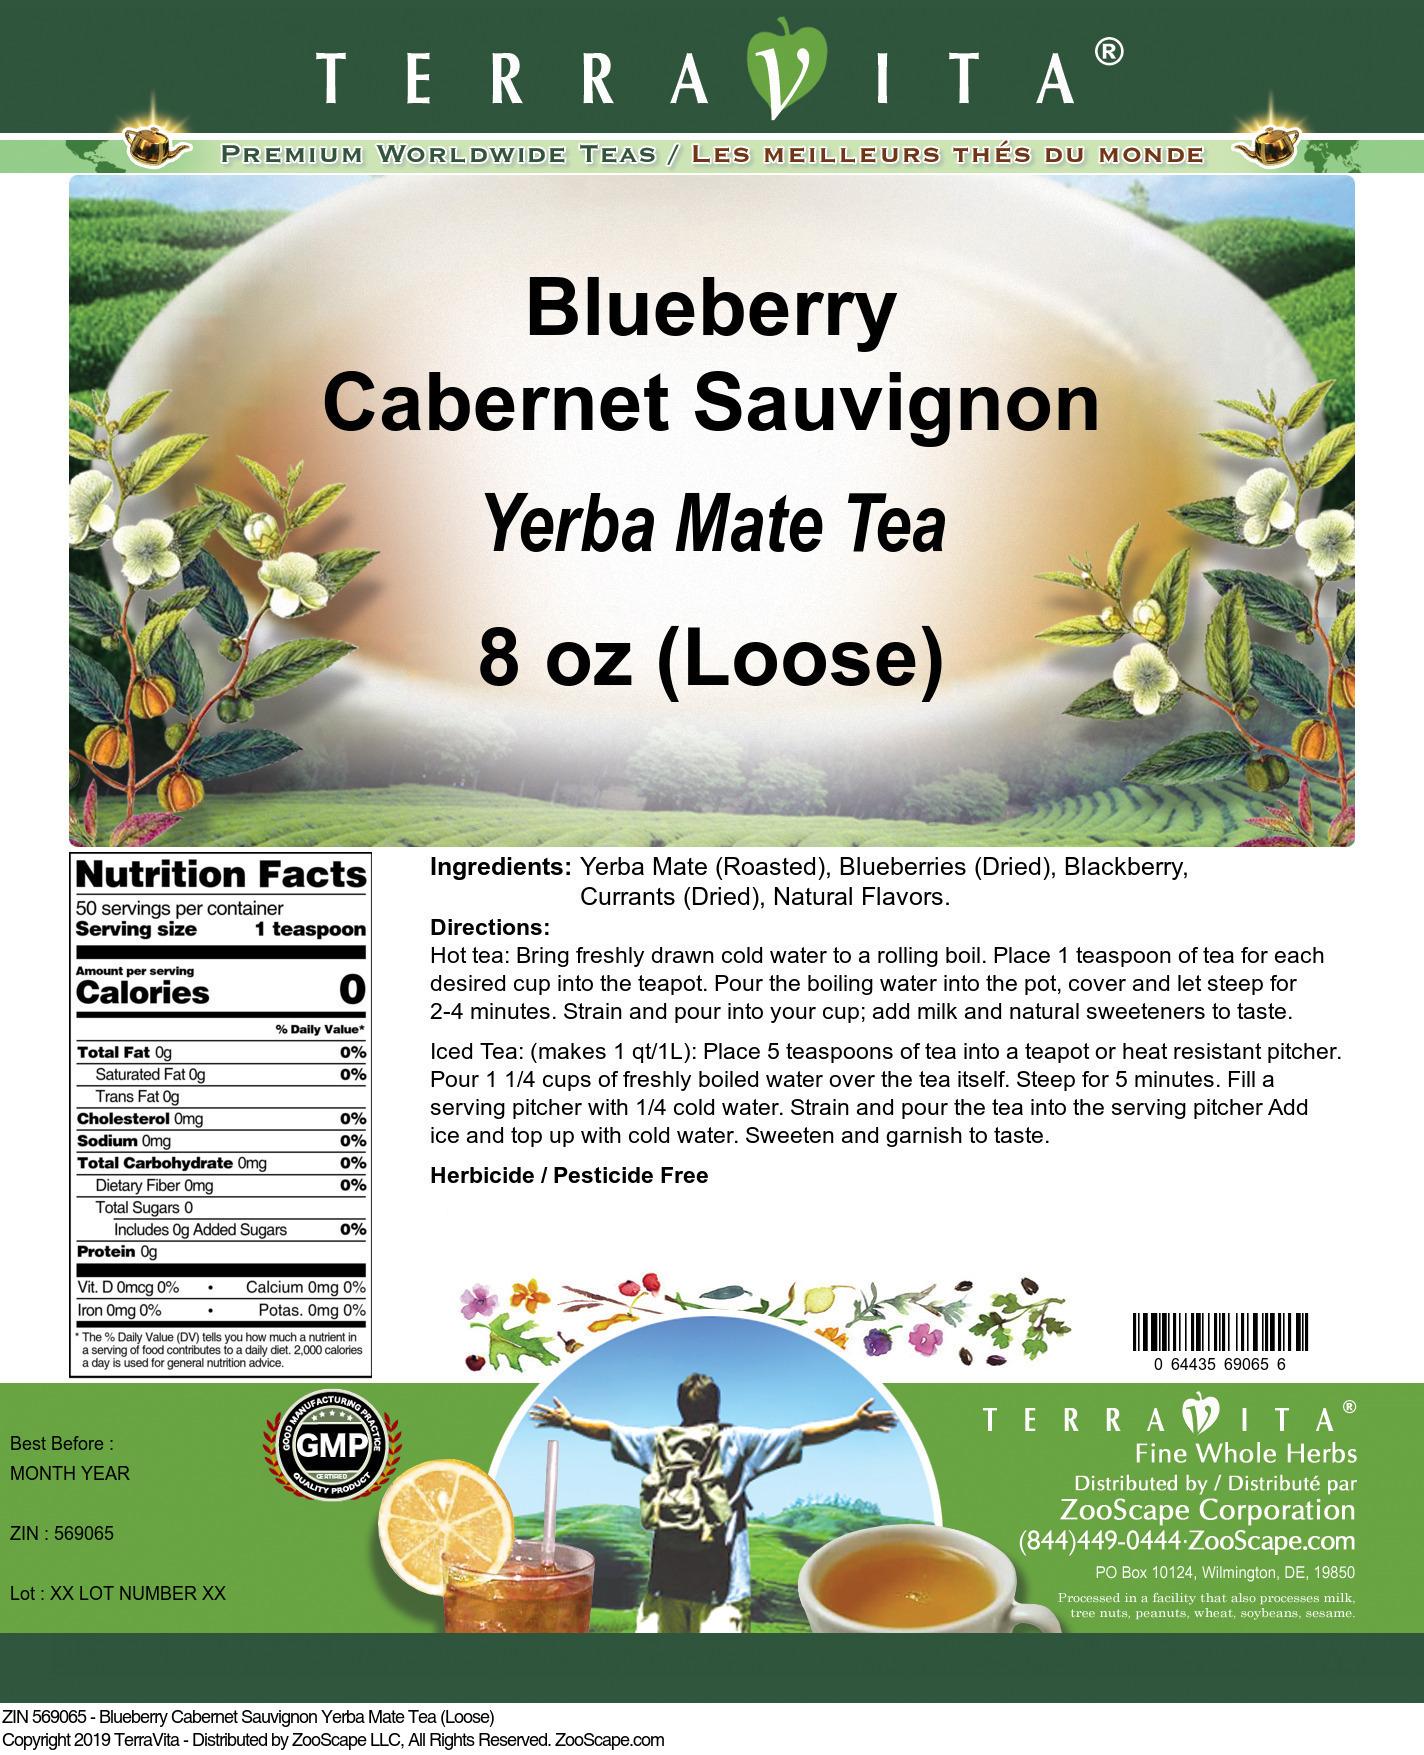 Blueberry Cabernet Sauvignon Yerba Mate Tea (Loose)